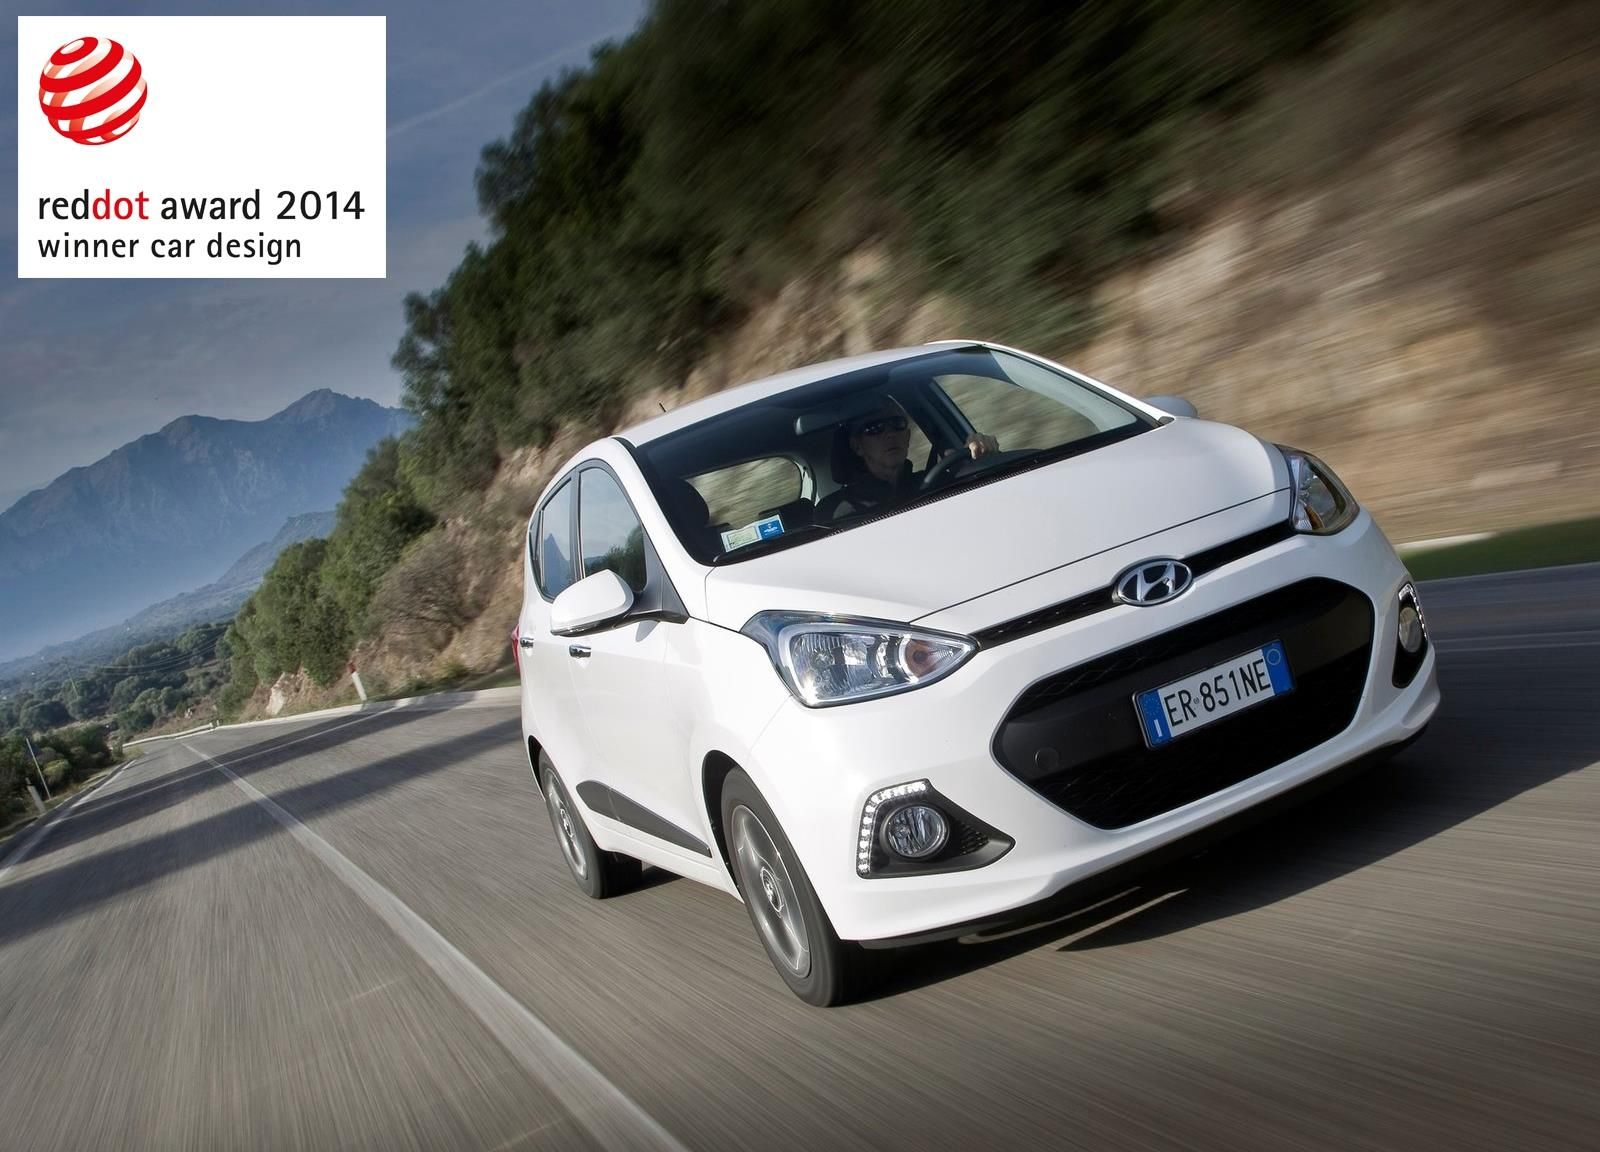 Hyundai Motor Received The World S Most Prestigious Red Dot